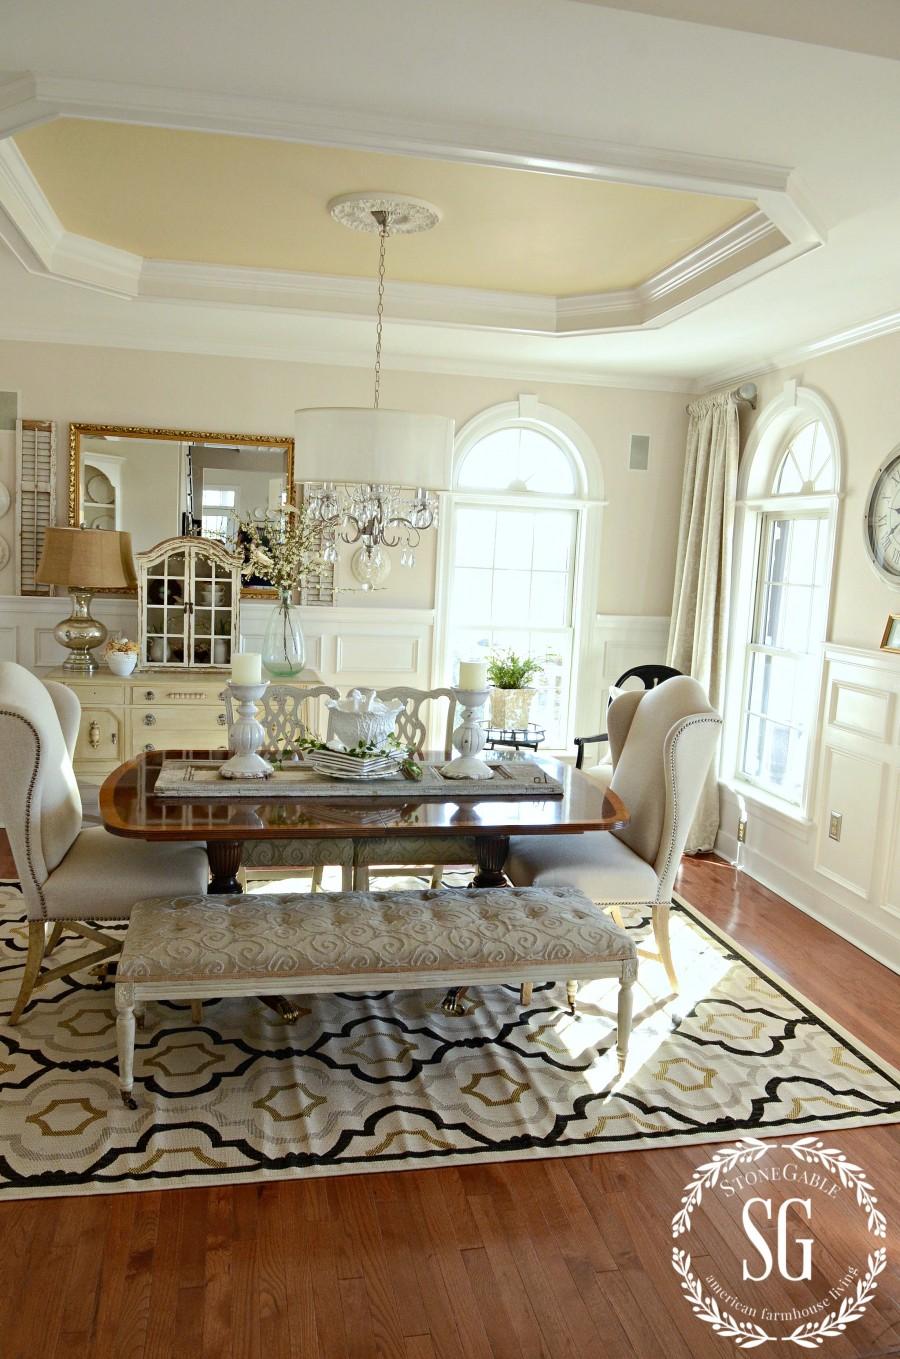 NEW DINING ROOM RUG-updated carpet-stonegableblog.com